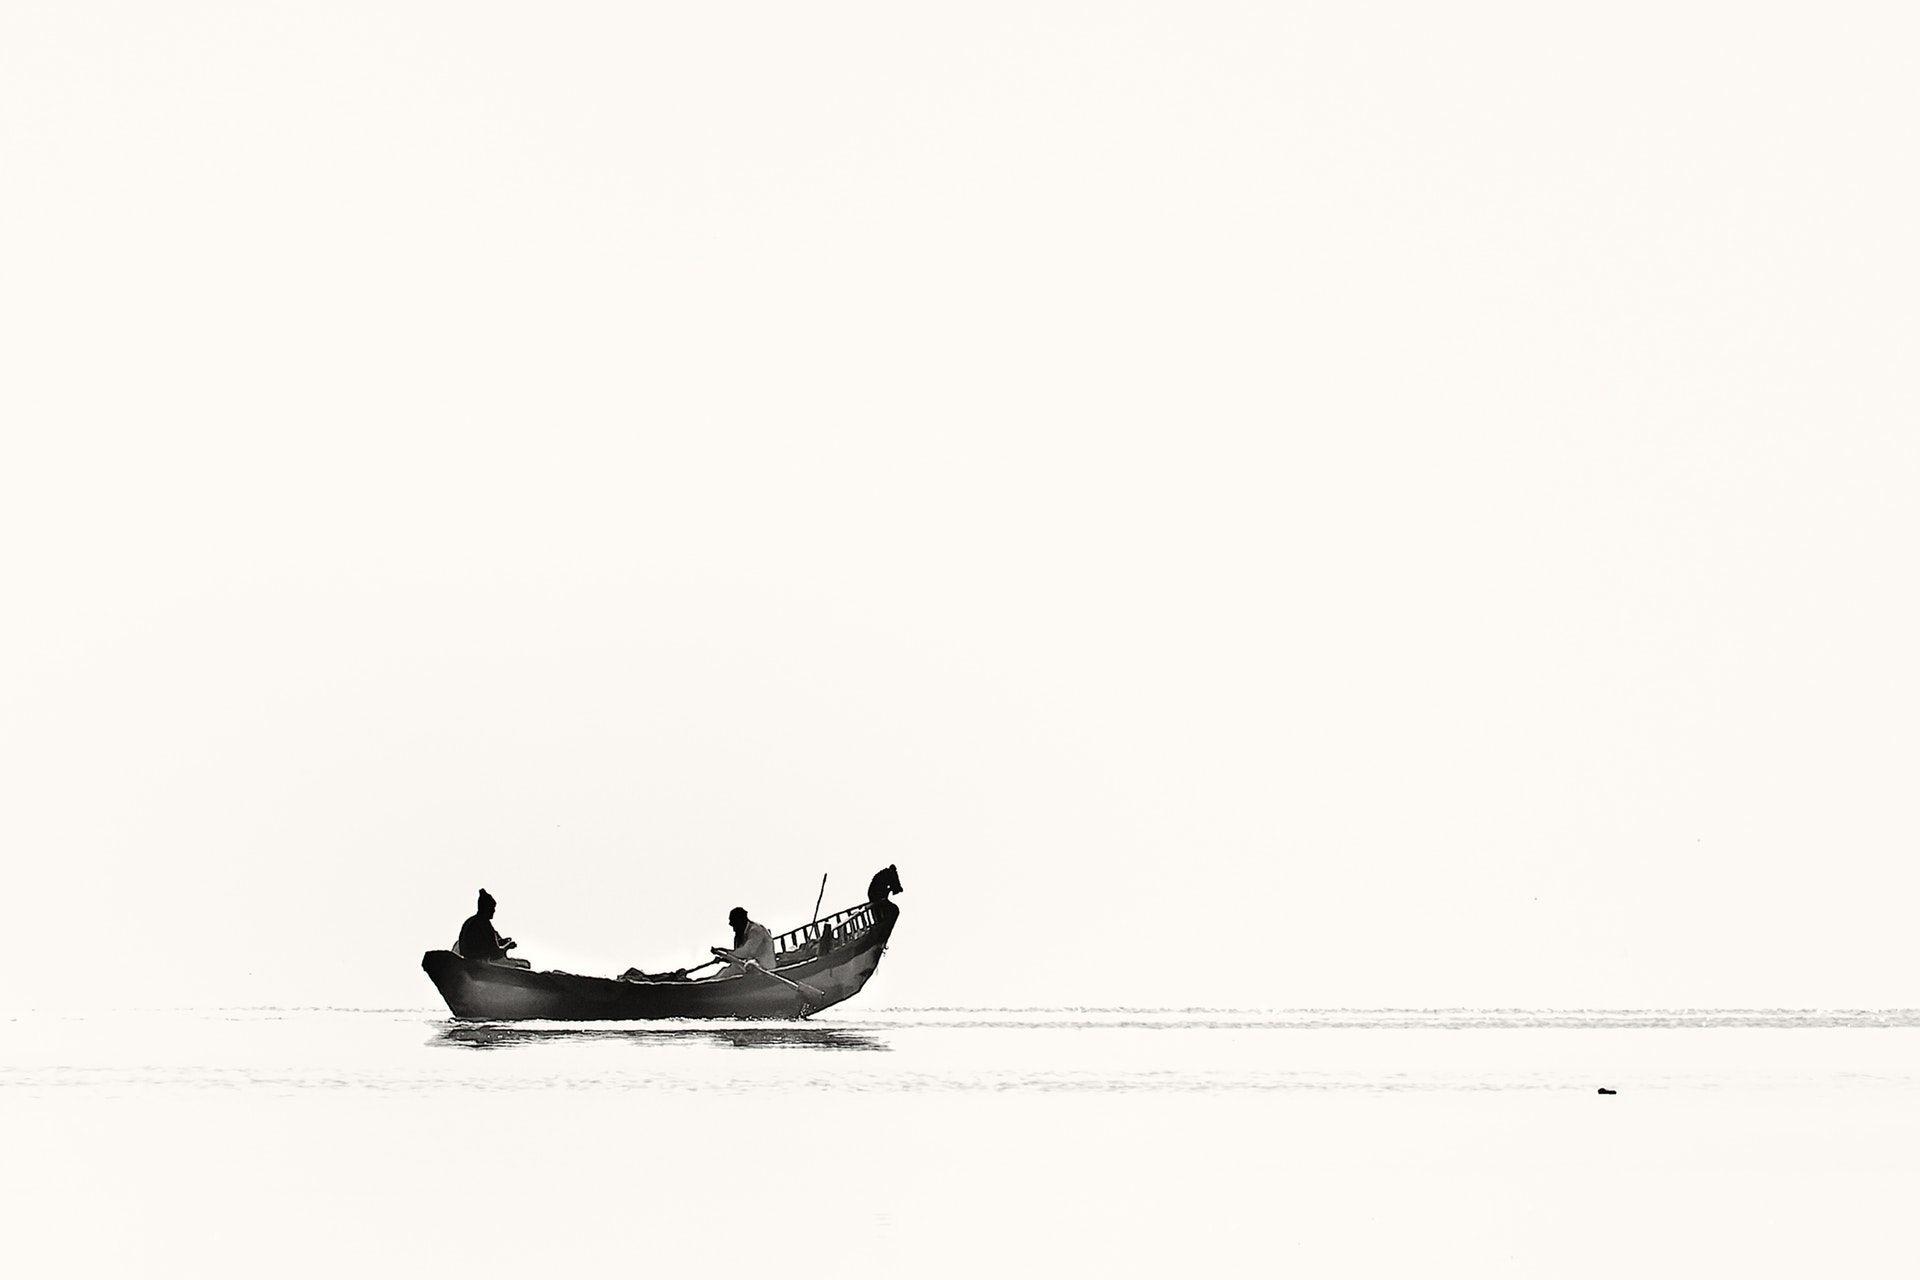 عکس زمینه دو فرد قایق سوار در آب پس زمینه